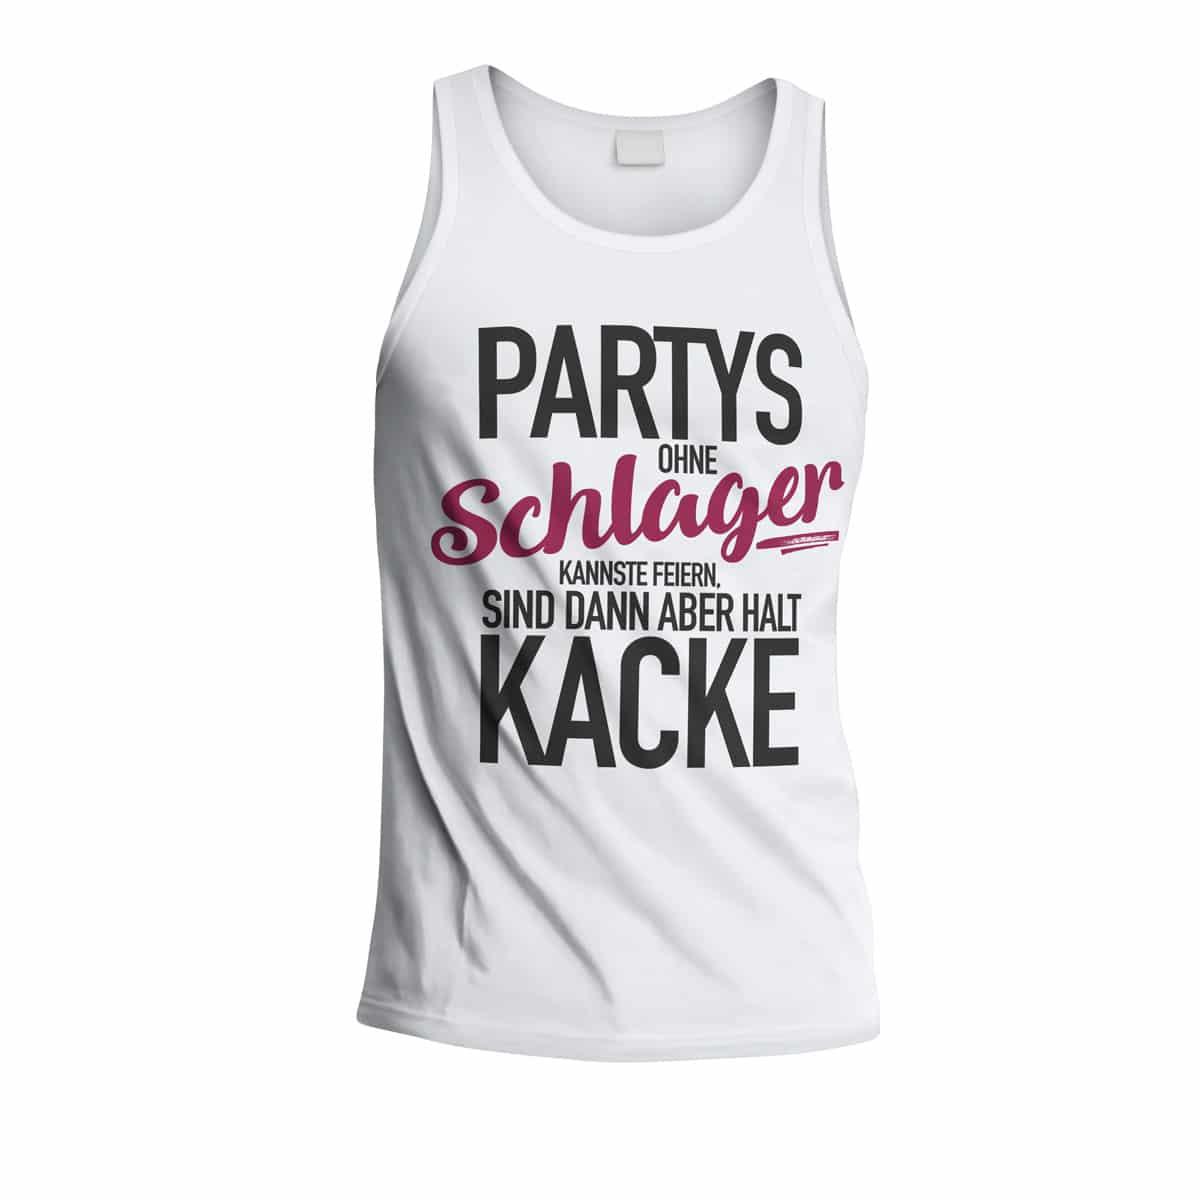 schlagerfans-tanktop-party-schlager-kacke-weiss